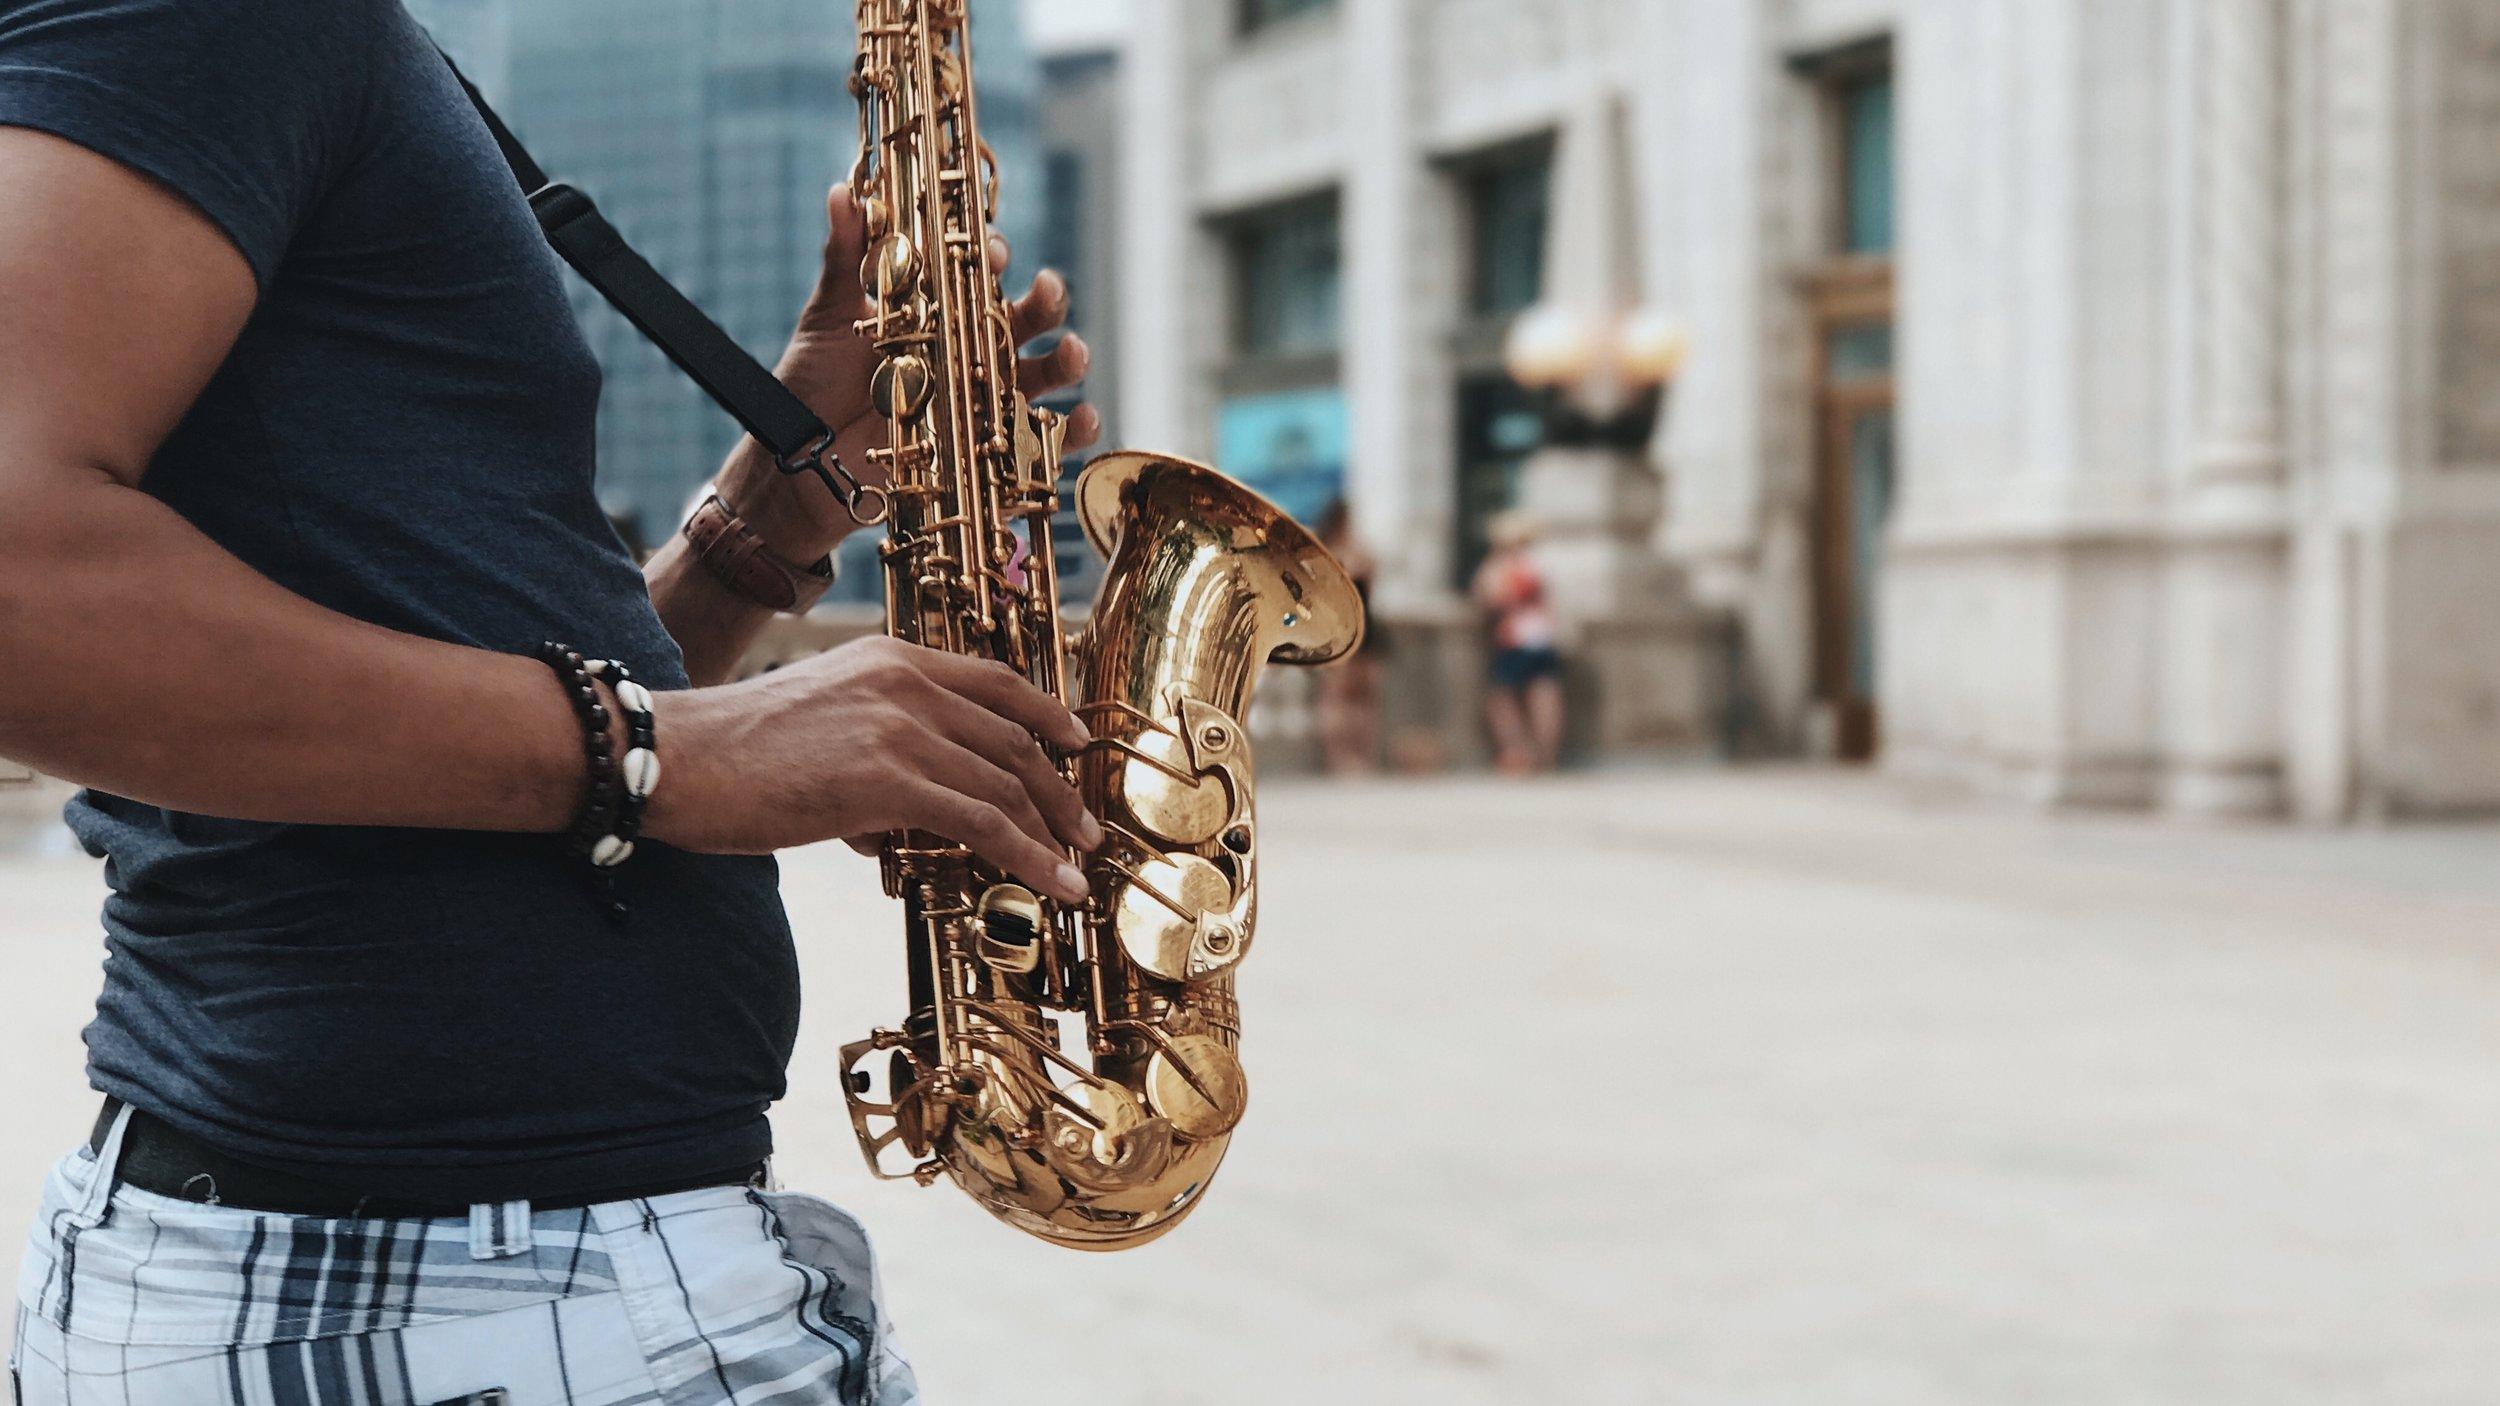 Saxophone, Chicago, 9/17/2017